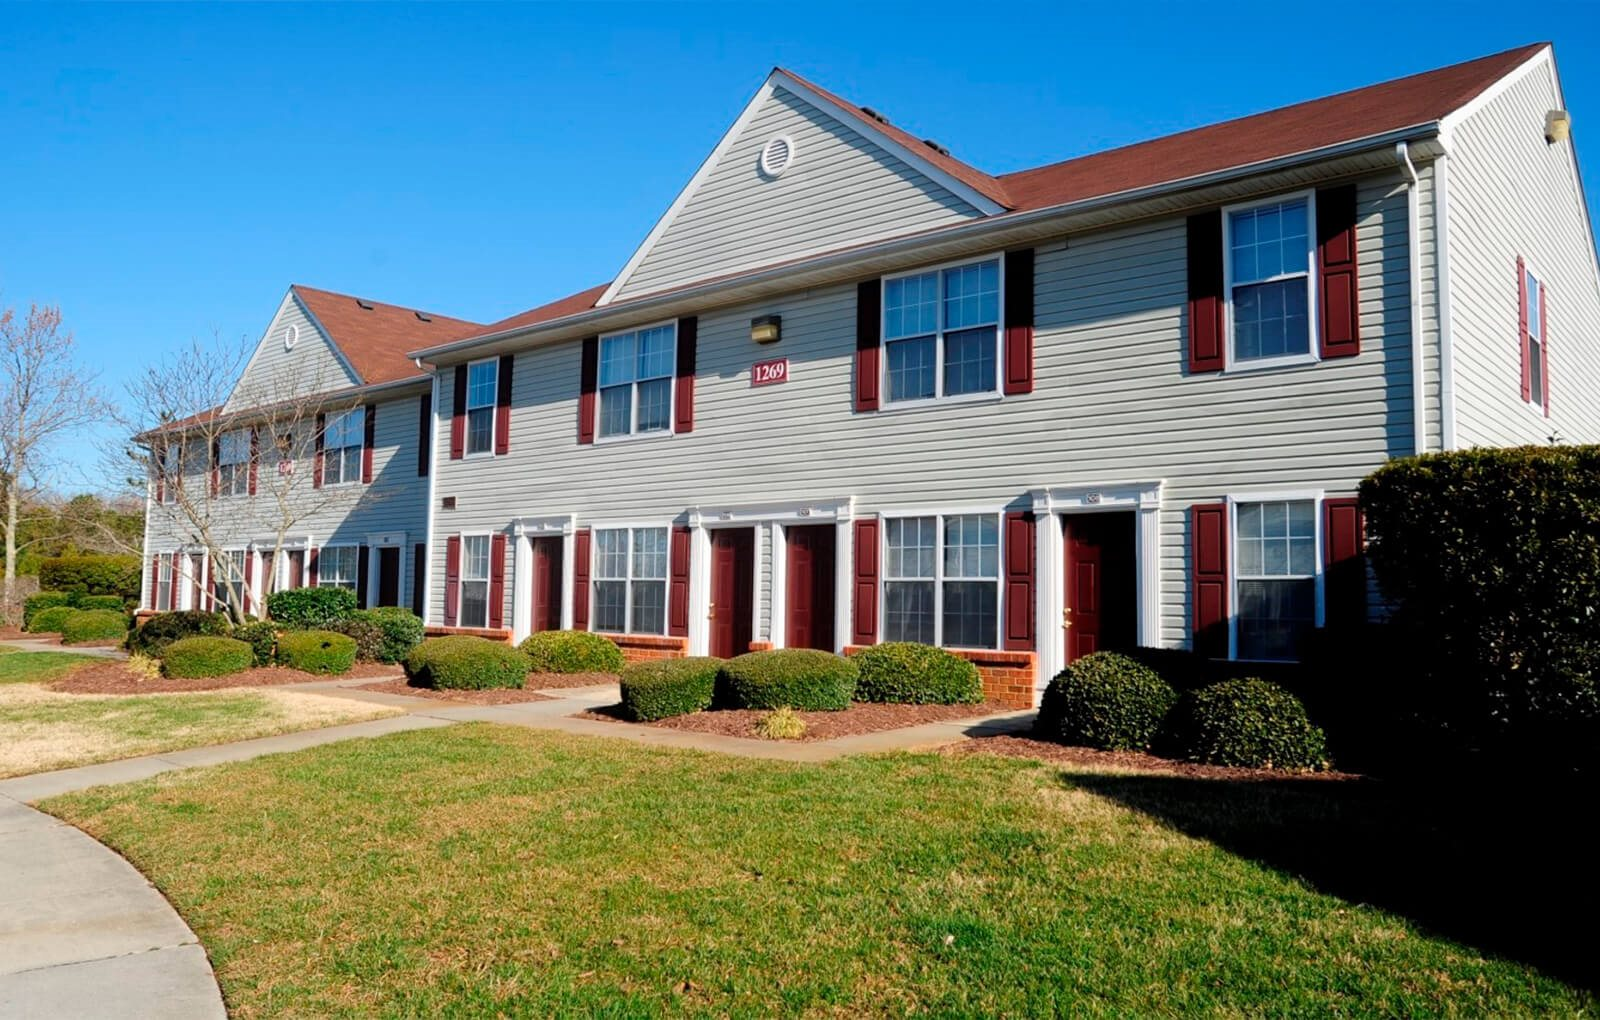 Green Outdoor at Ocean Gate Apartments, Virginia Beach, VA, 23454